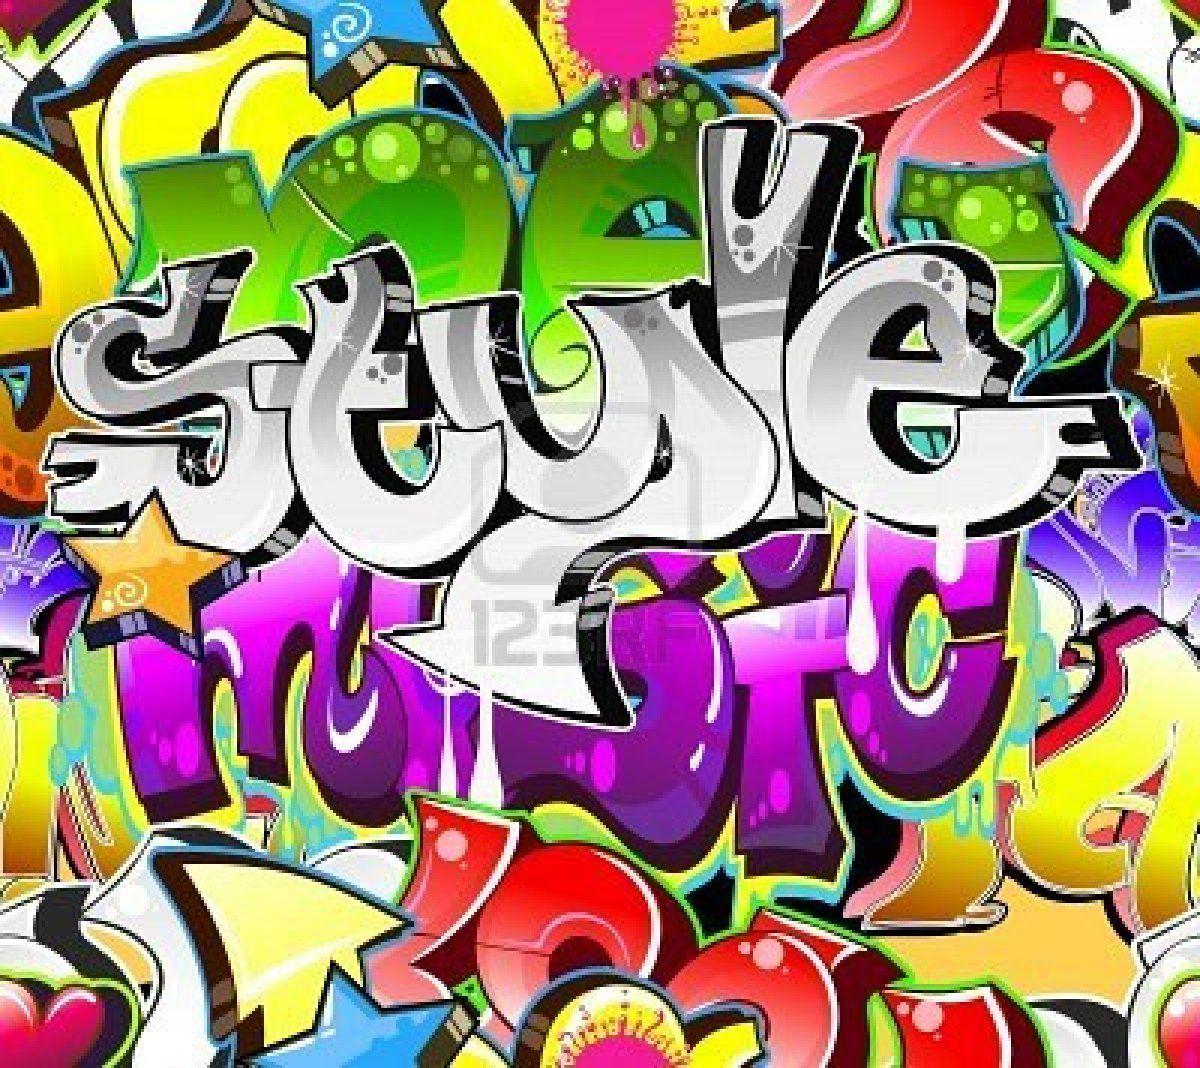 Graffiti art designs - Graffiti Graffiti Urban Art Background Seamless Design Royalty Free Cliparts